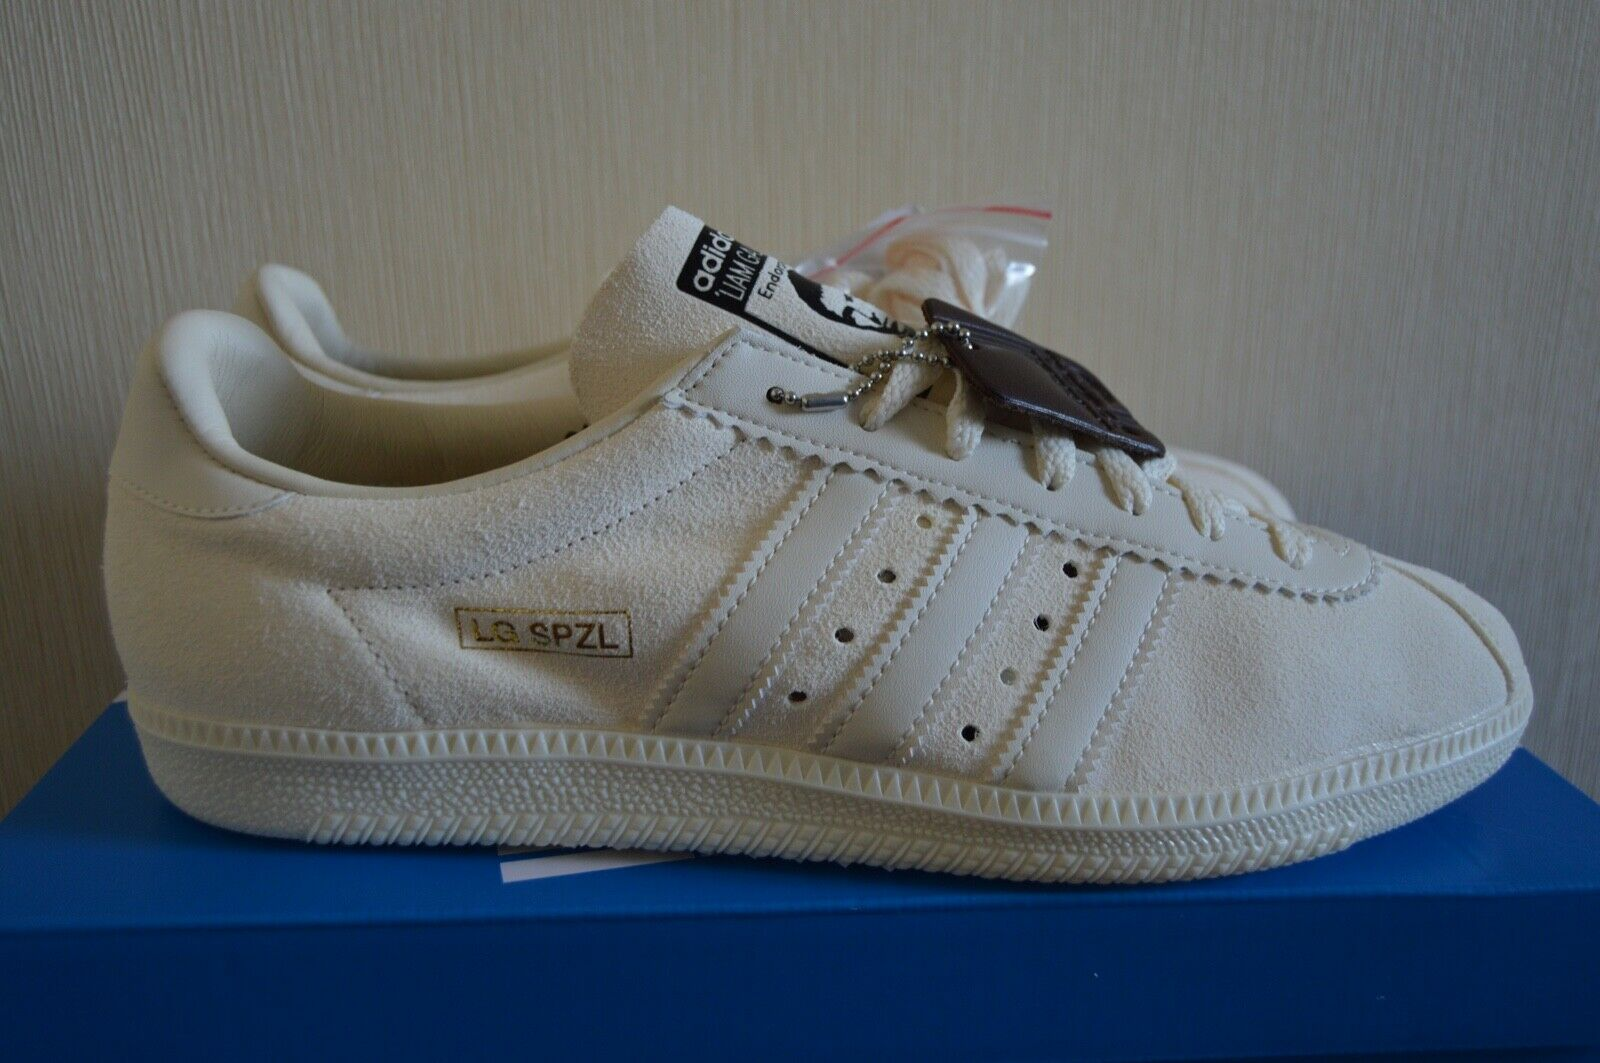 adidas lg spzl 13 uk EE8789 blackburn